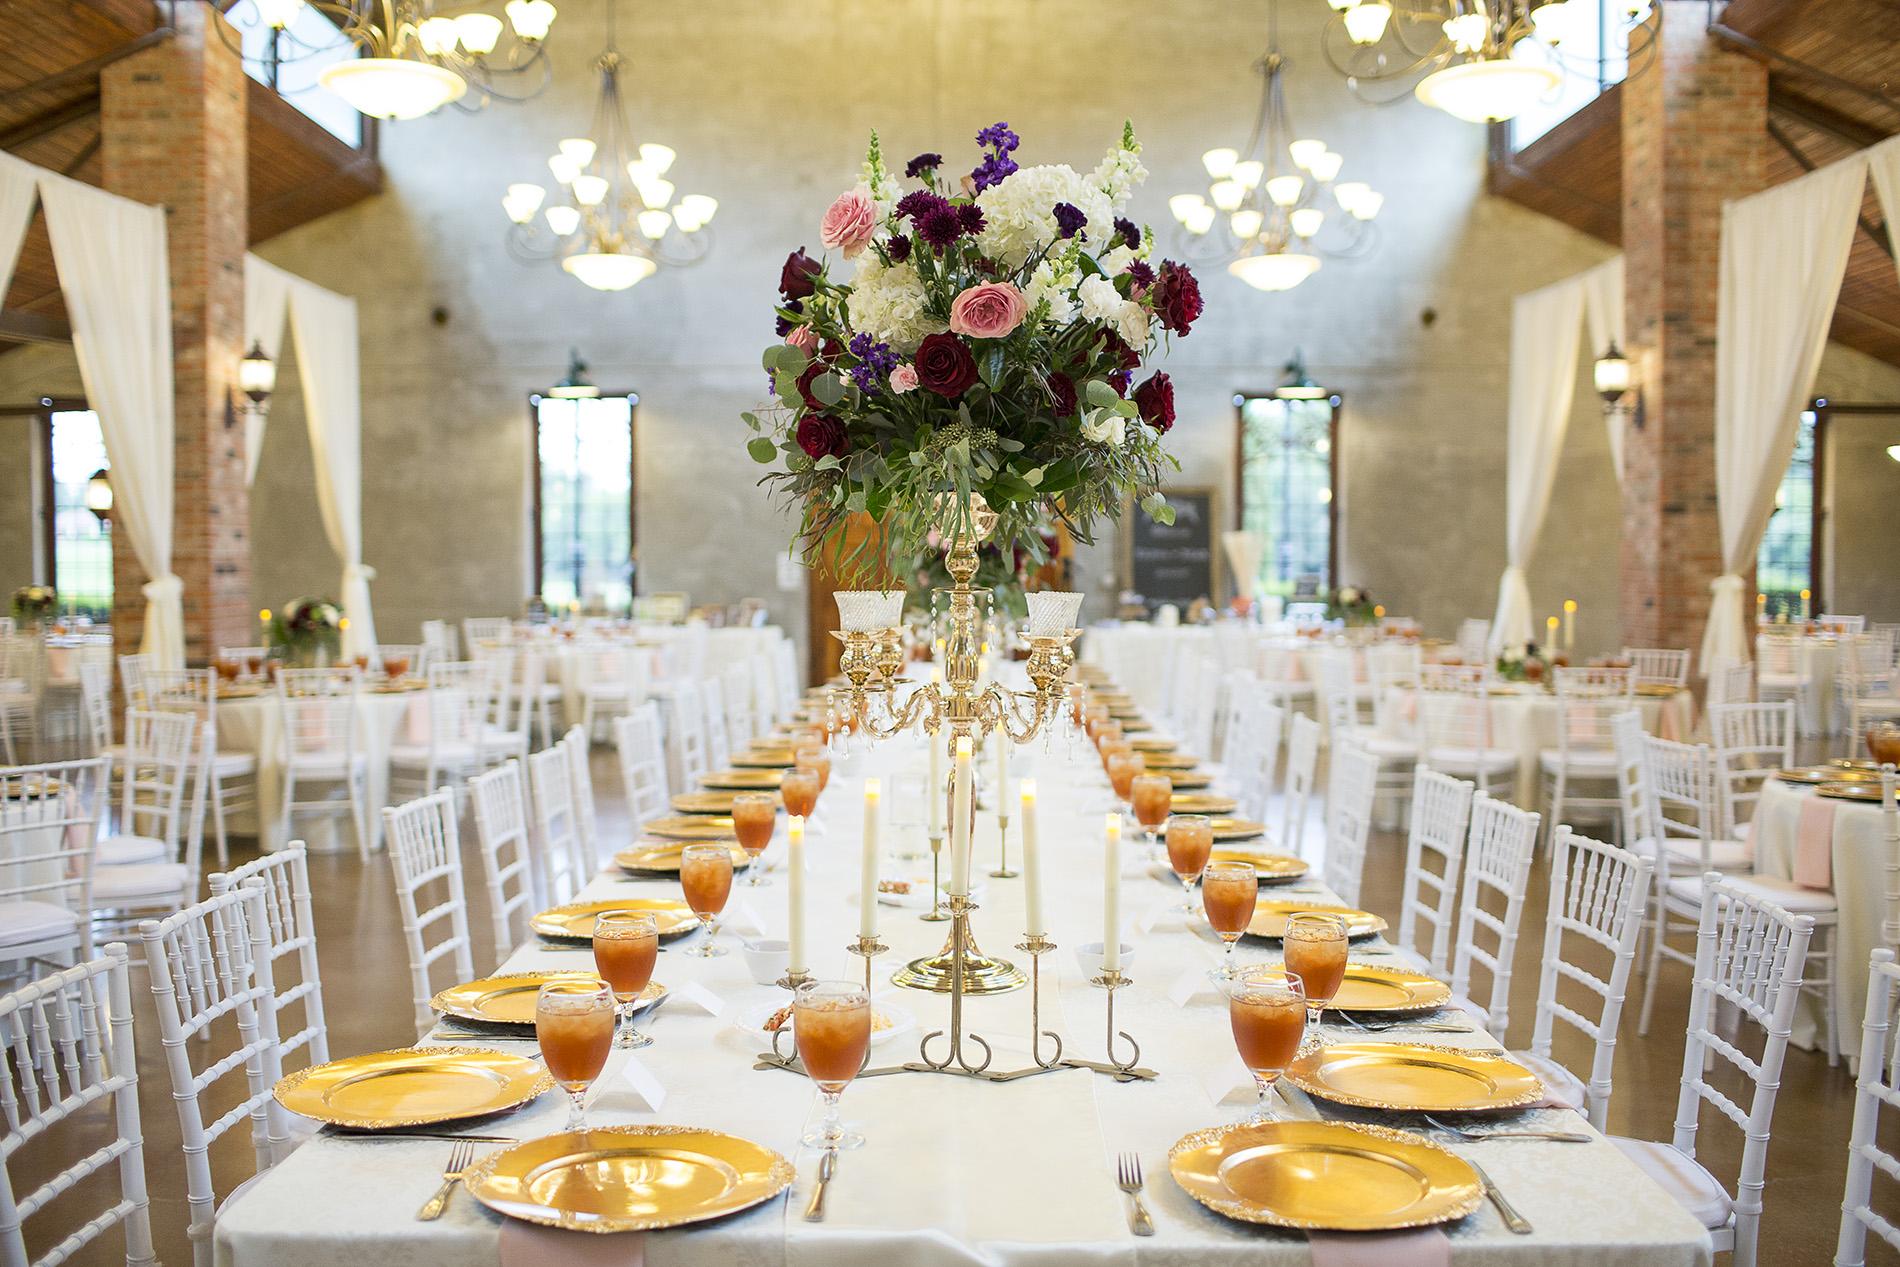 Houston-venue-Olde-Dobbin-Station-Romantic-Classic-Wedding-Photographer-084.jpg